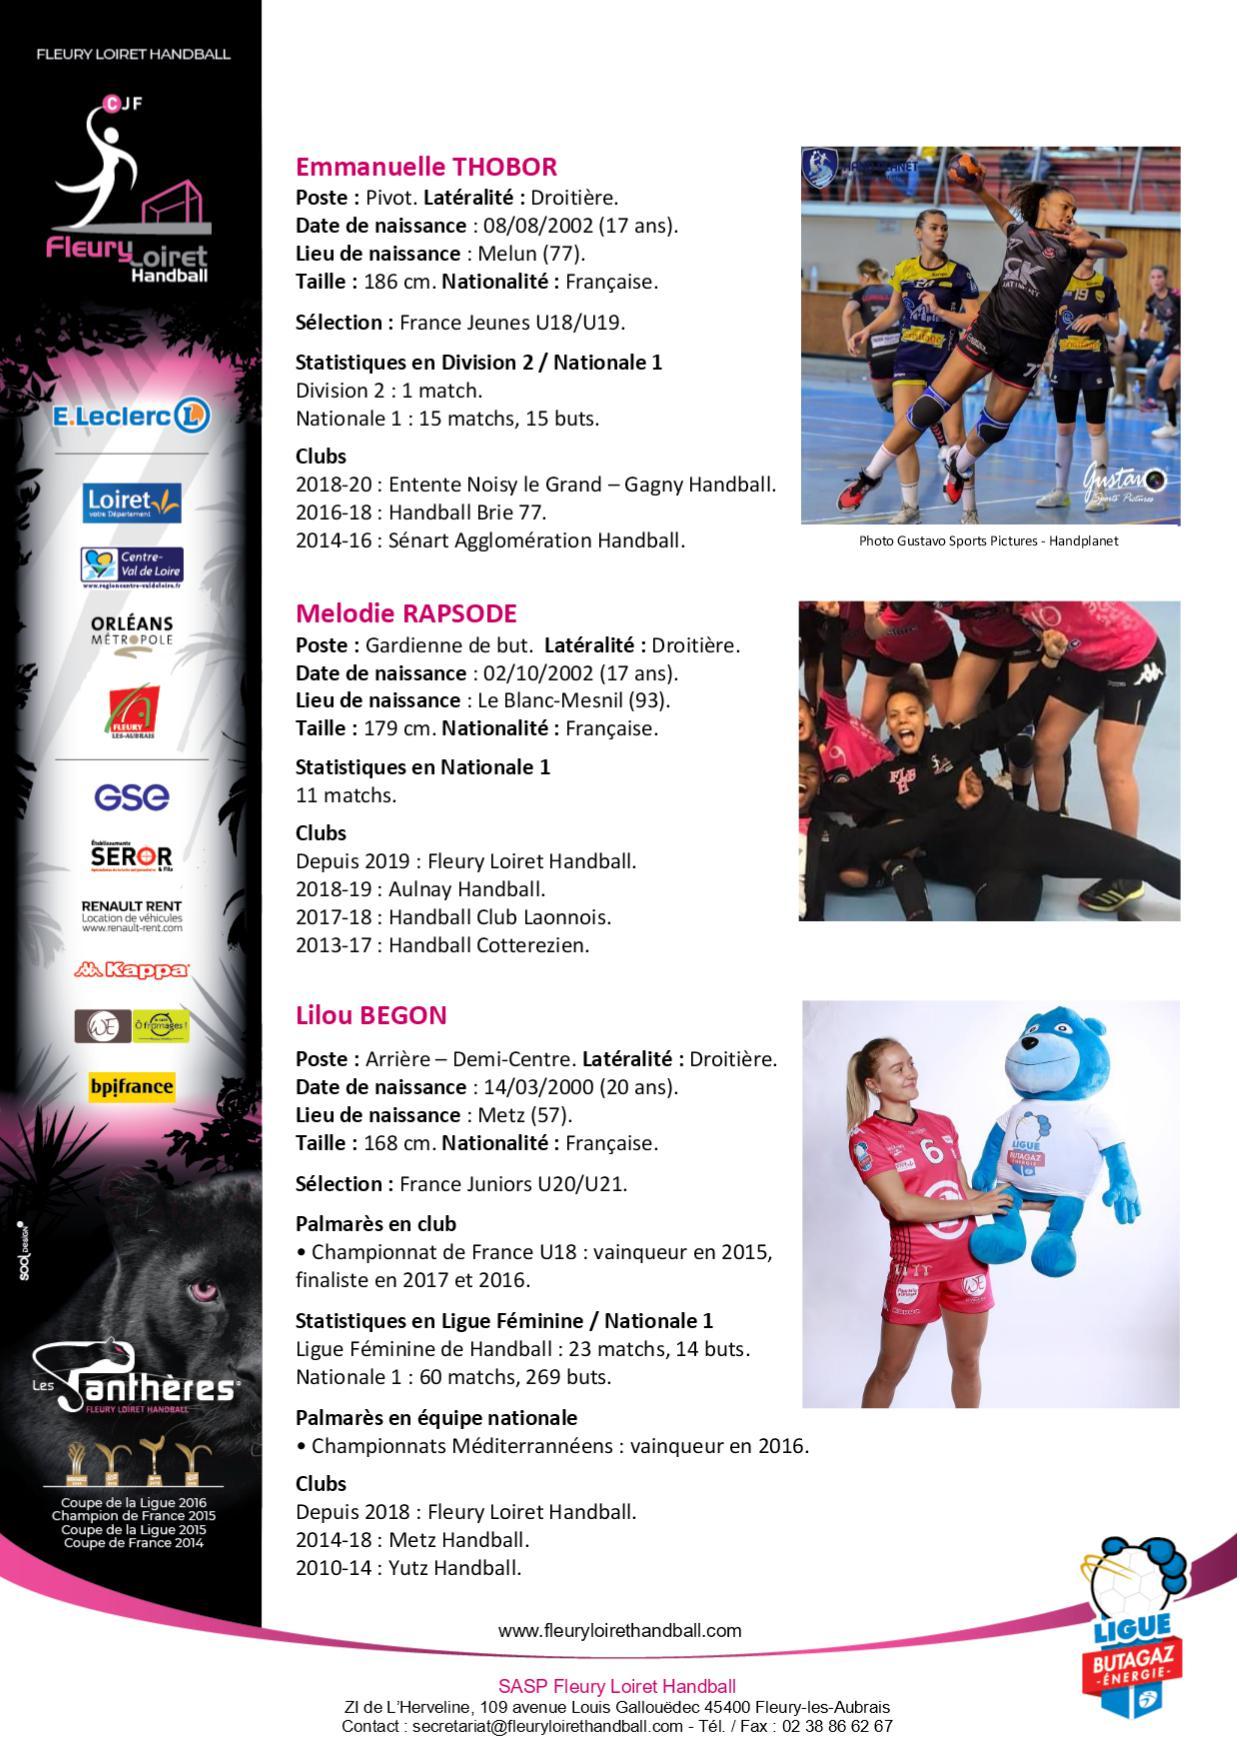 Aout 2015 - Communiqué Fleury Loiret Handball - Jeudi 28 mai 20202.jpg